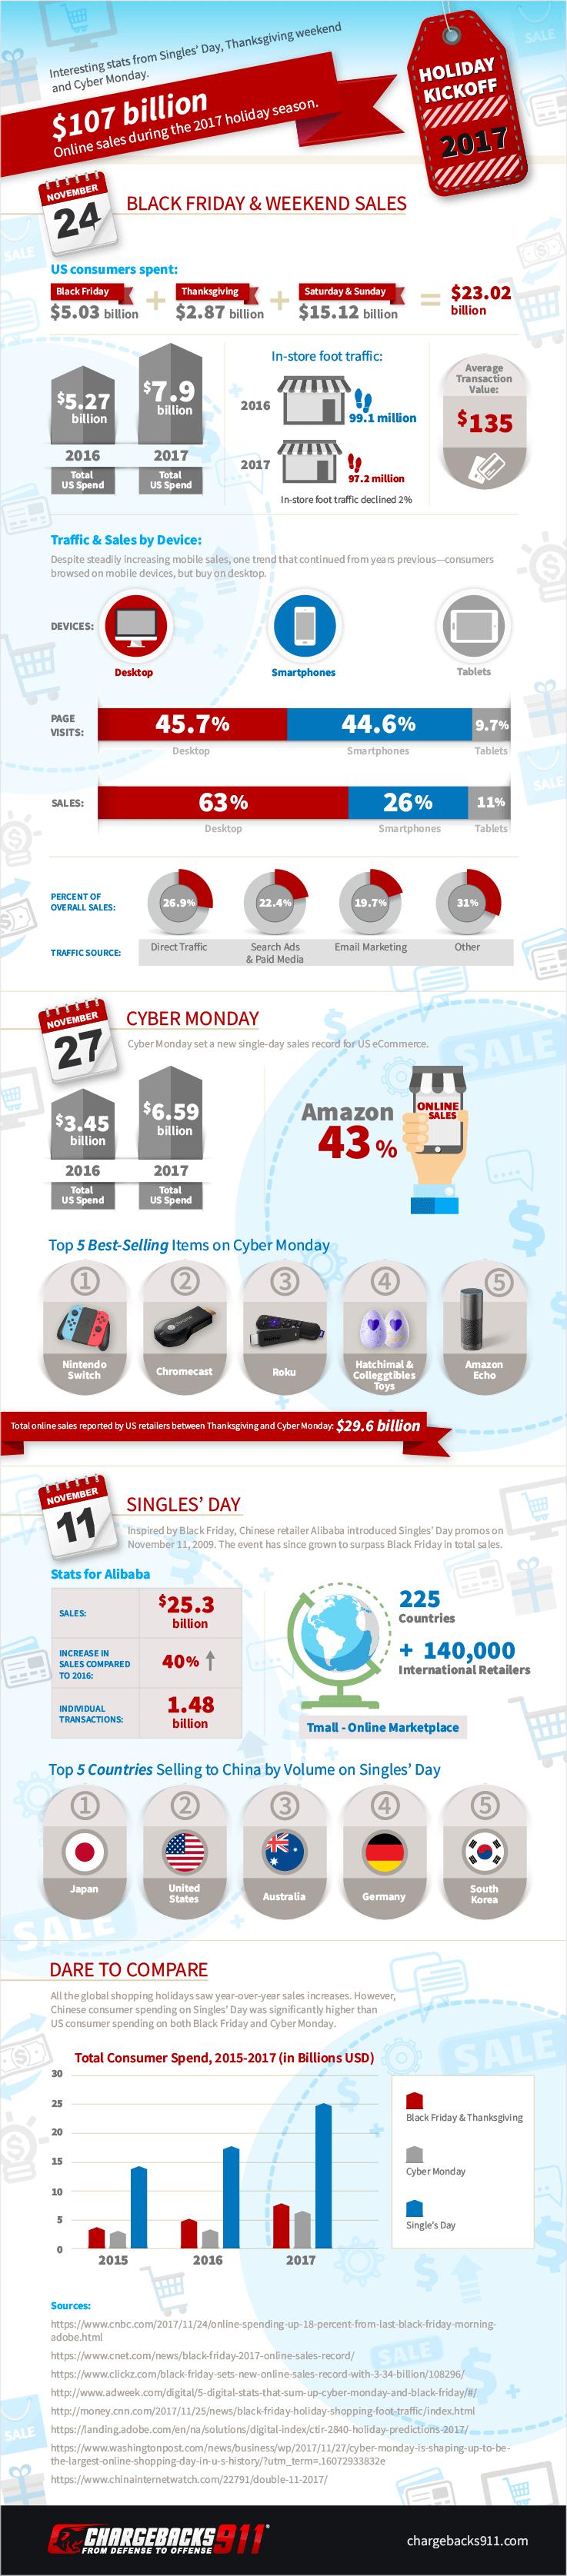 Chargebacks911 Black Friday 2017 Infographic